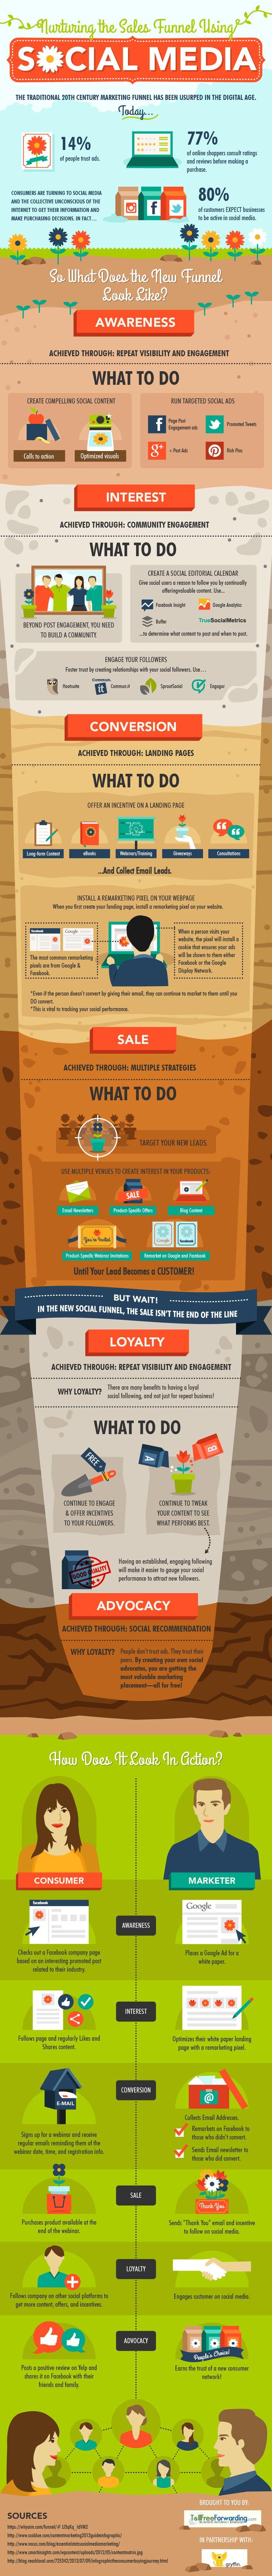 Nurturing the Sales Funnel Using Social Media #Marketing (Infographic) #sales #socialmedia